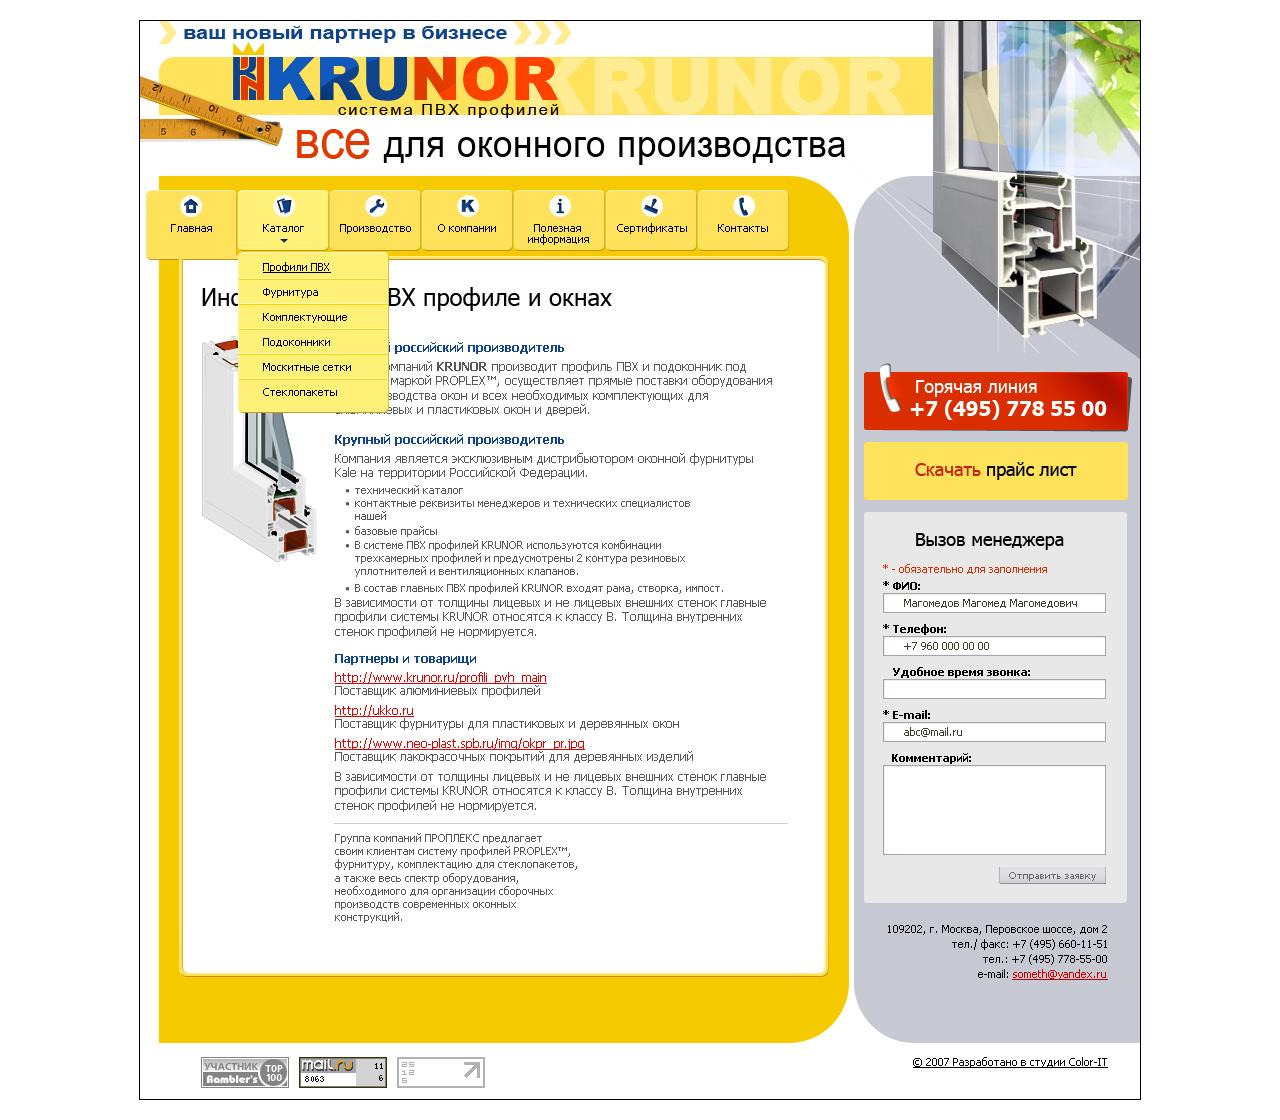 KRUNOR - система ПВХ профилей